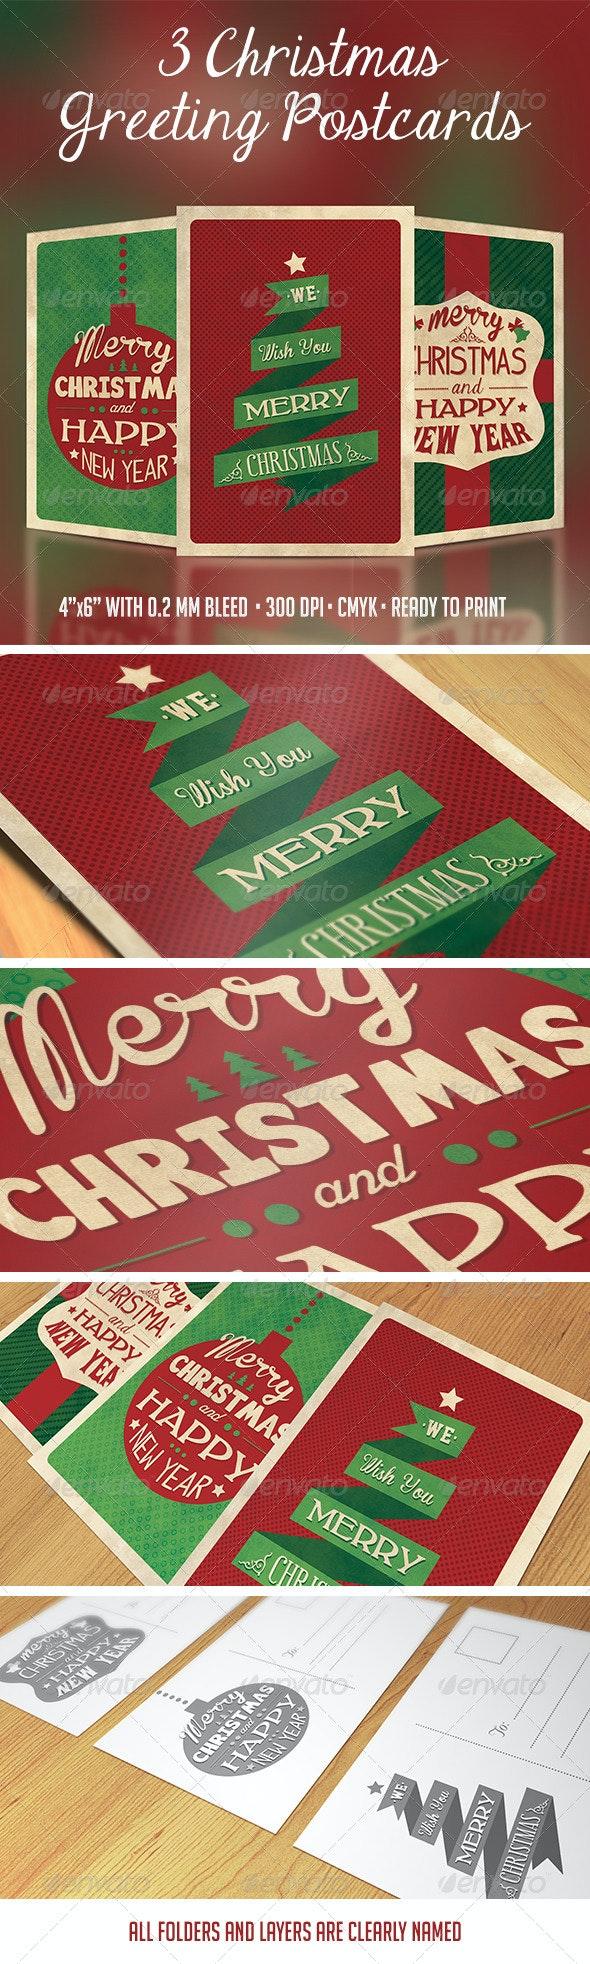 3 Christmas Greeting Postcards - Holidays Events